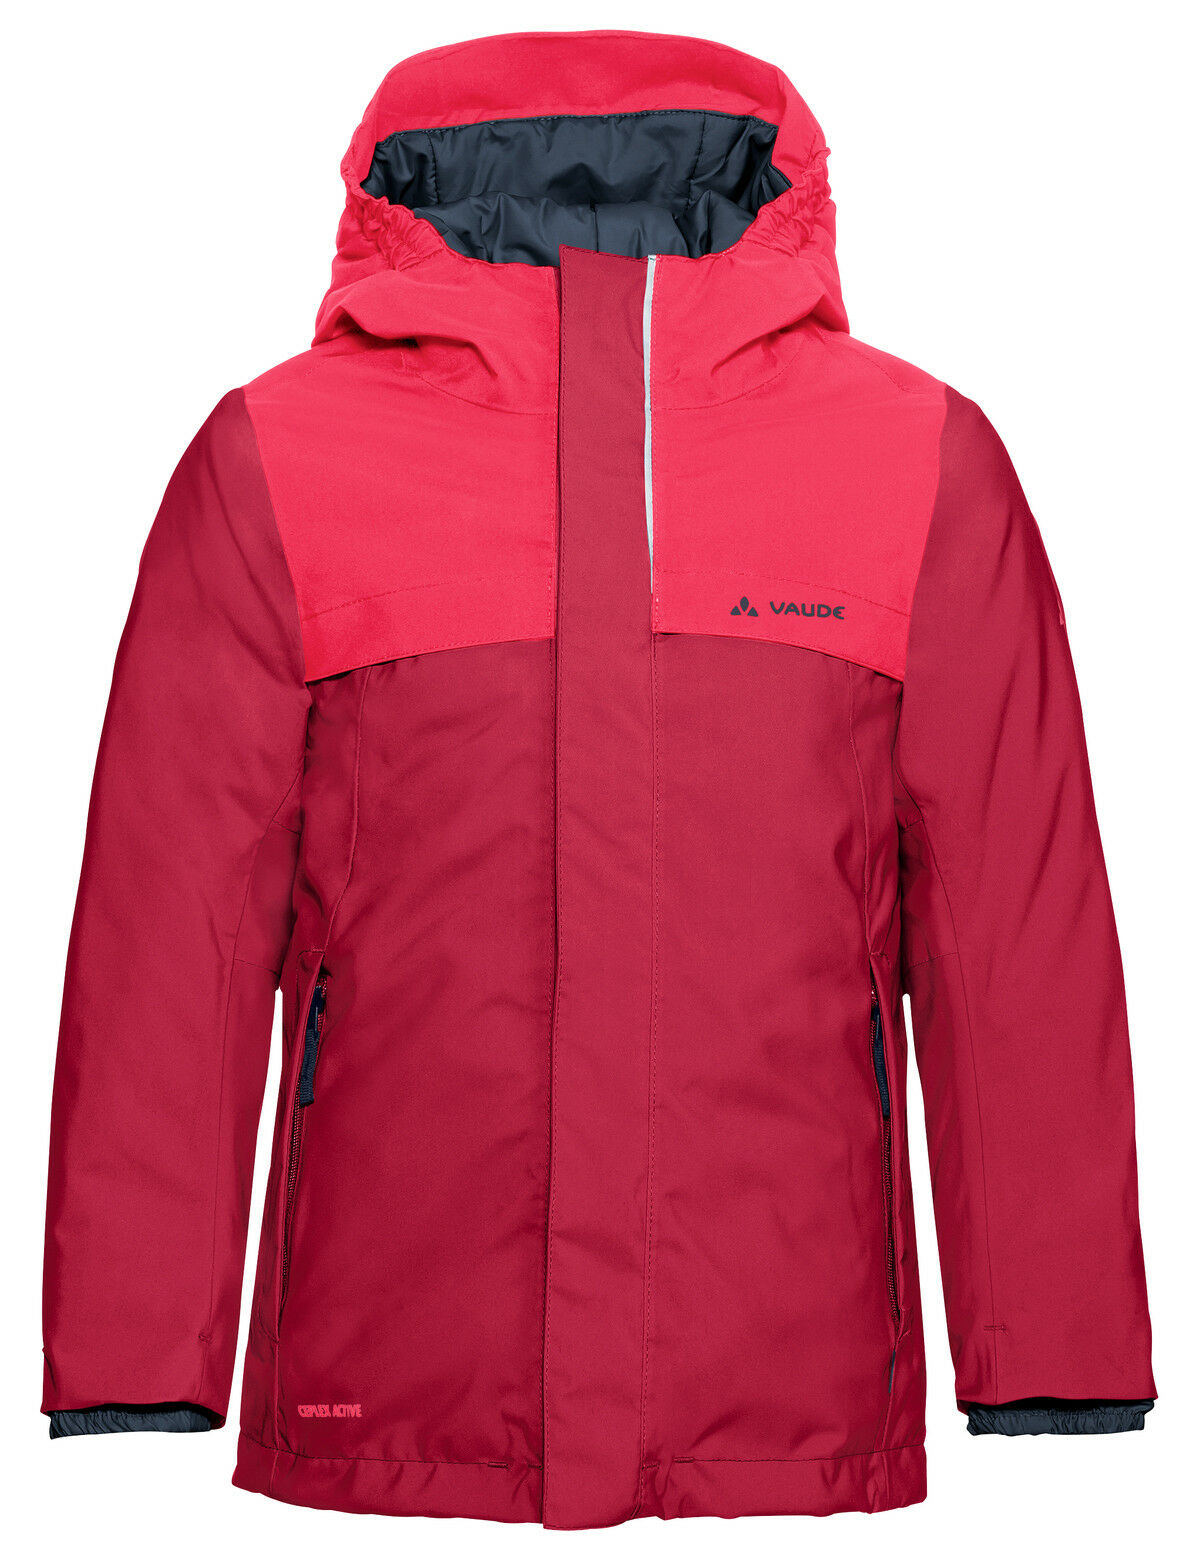 Vaude niños invierno chaqueta Kids igmu Jacket Girls Bright rosado 146 152